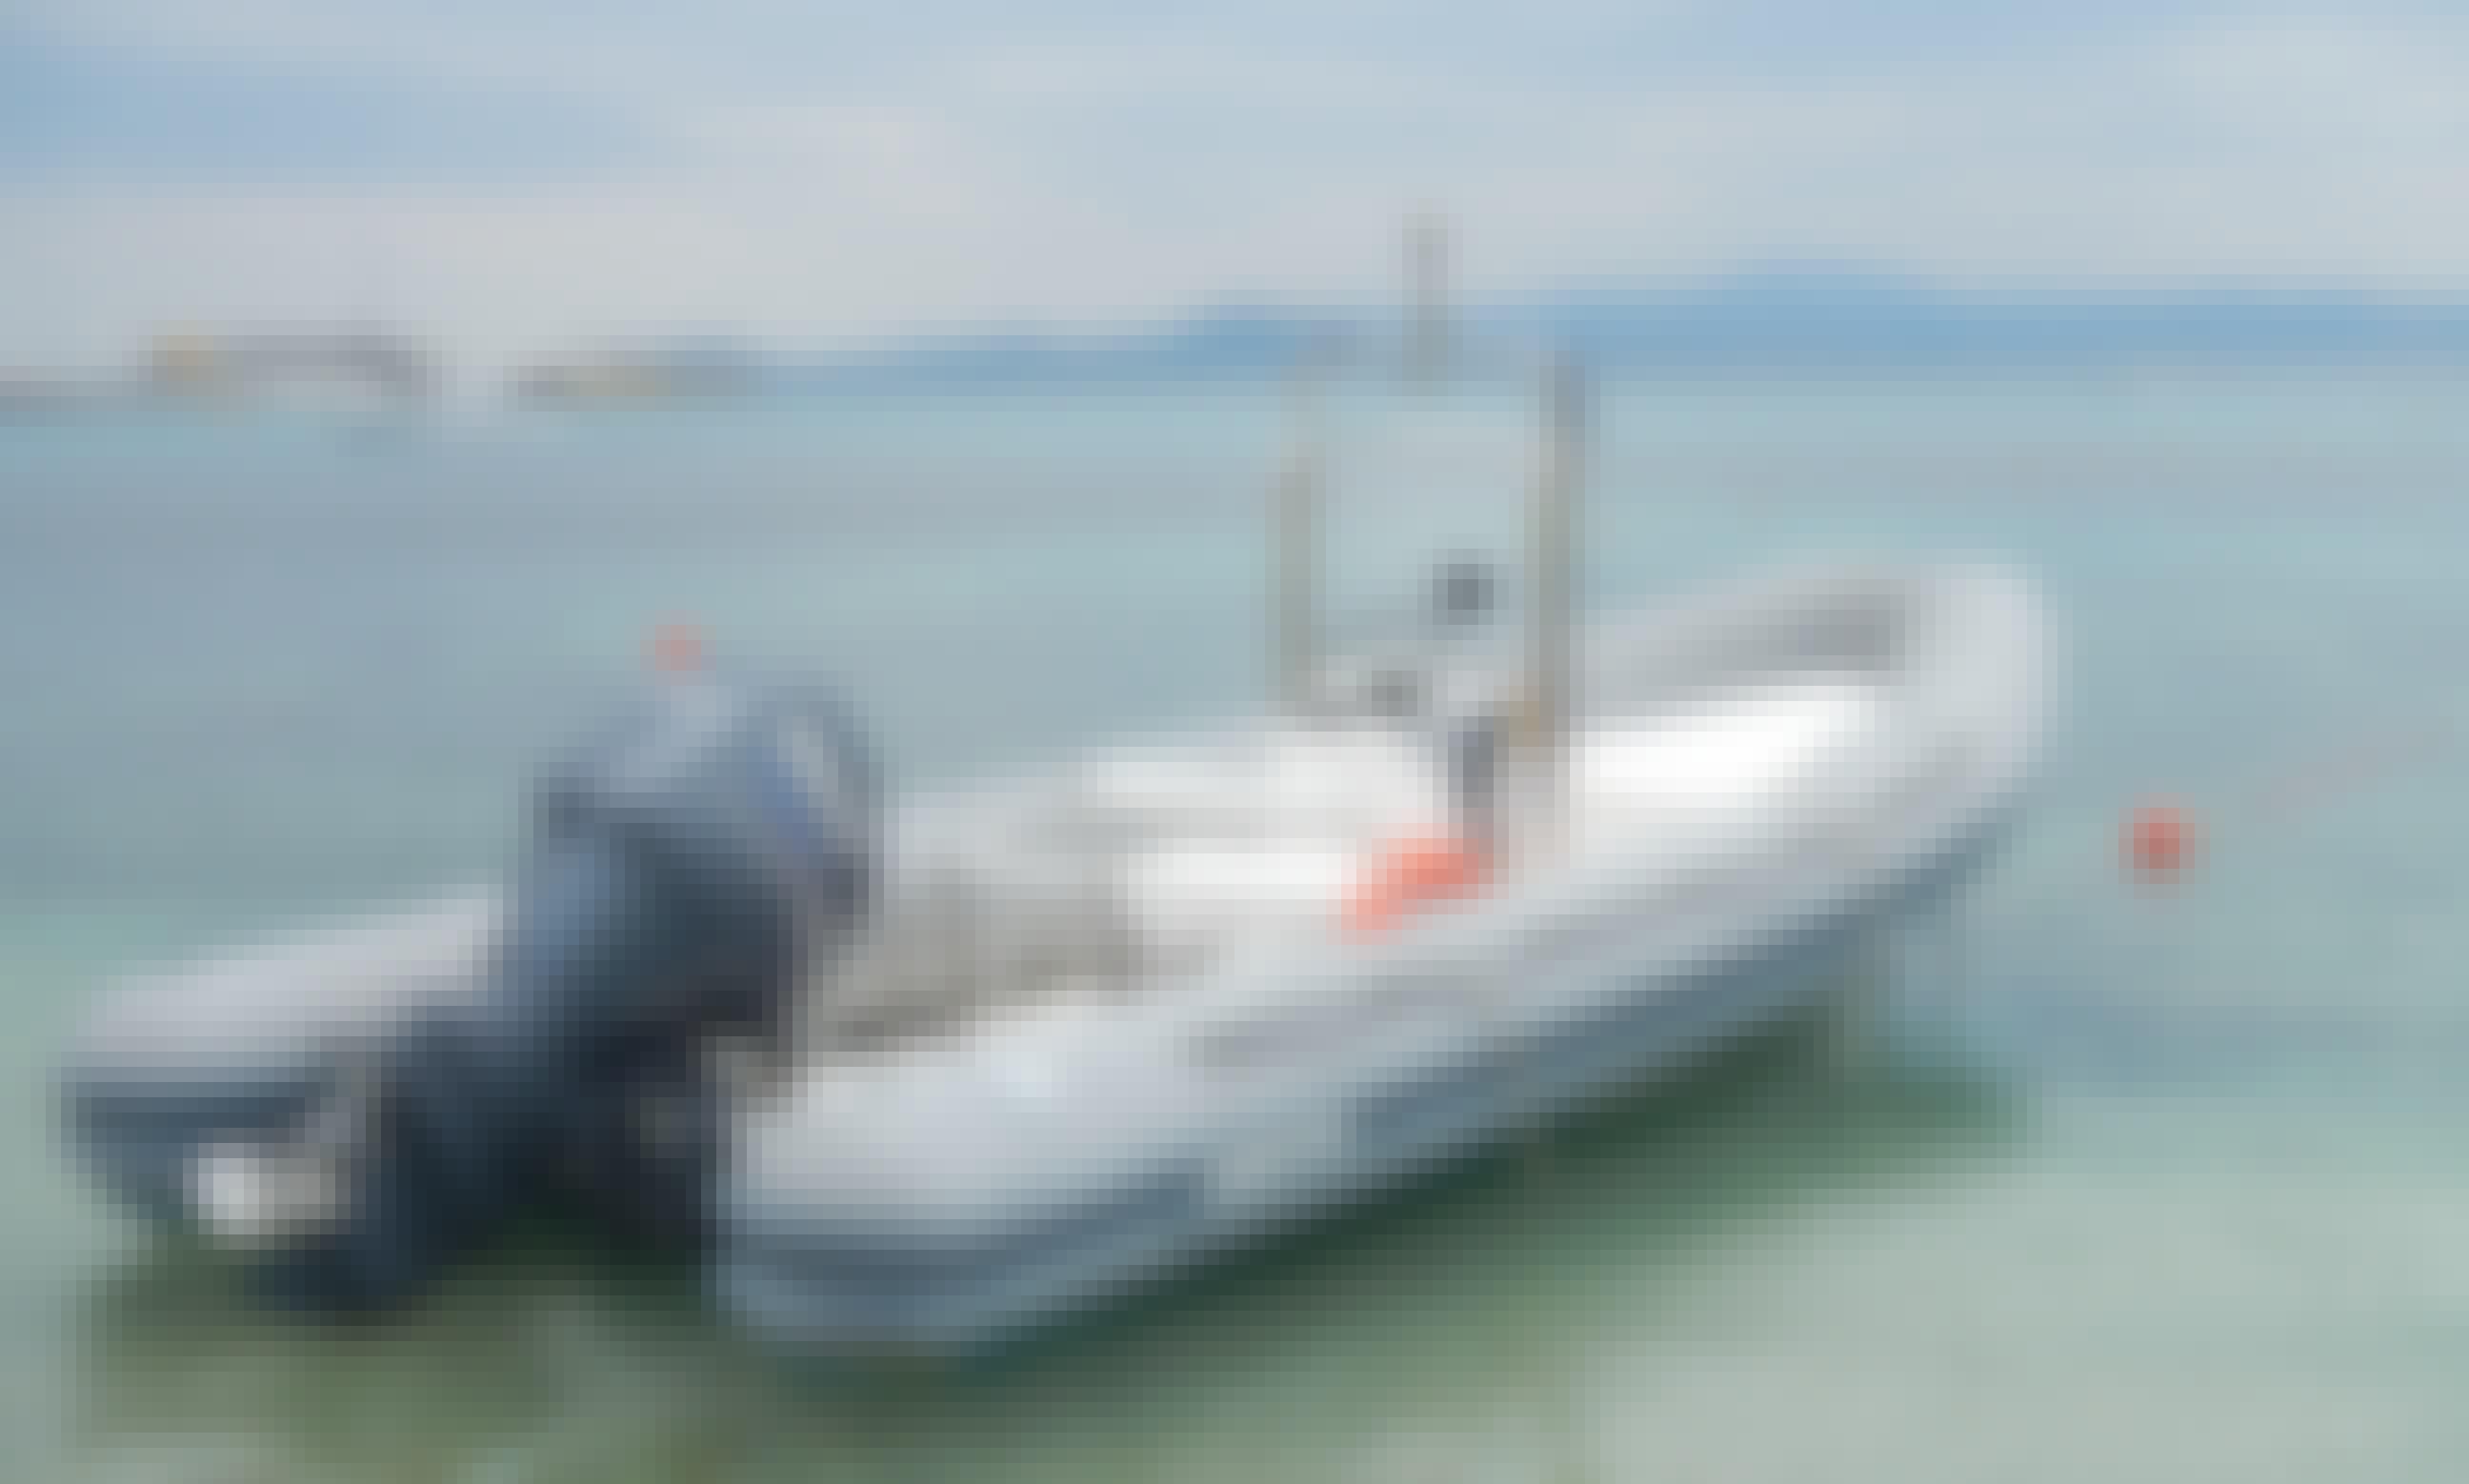 RIB Rental in Golfo Aranci for cruising around Sardinia